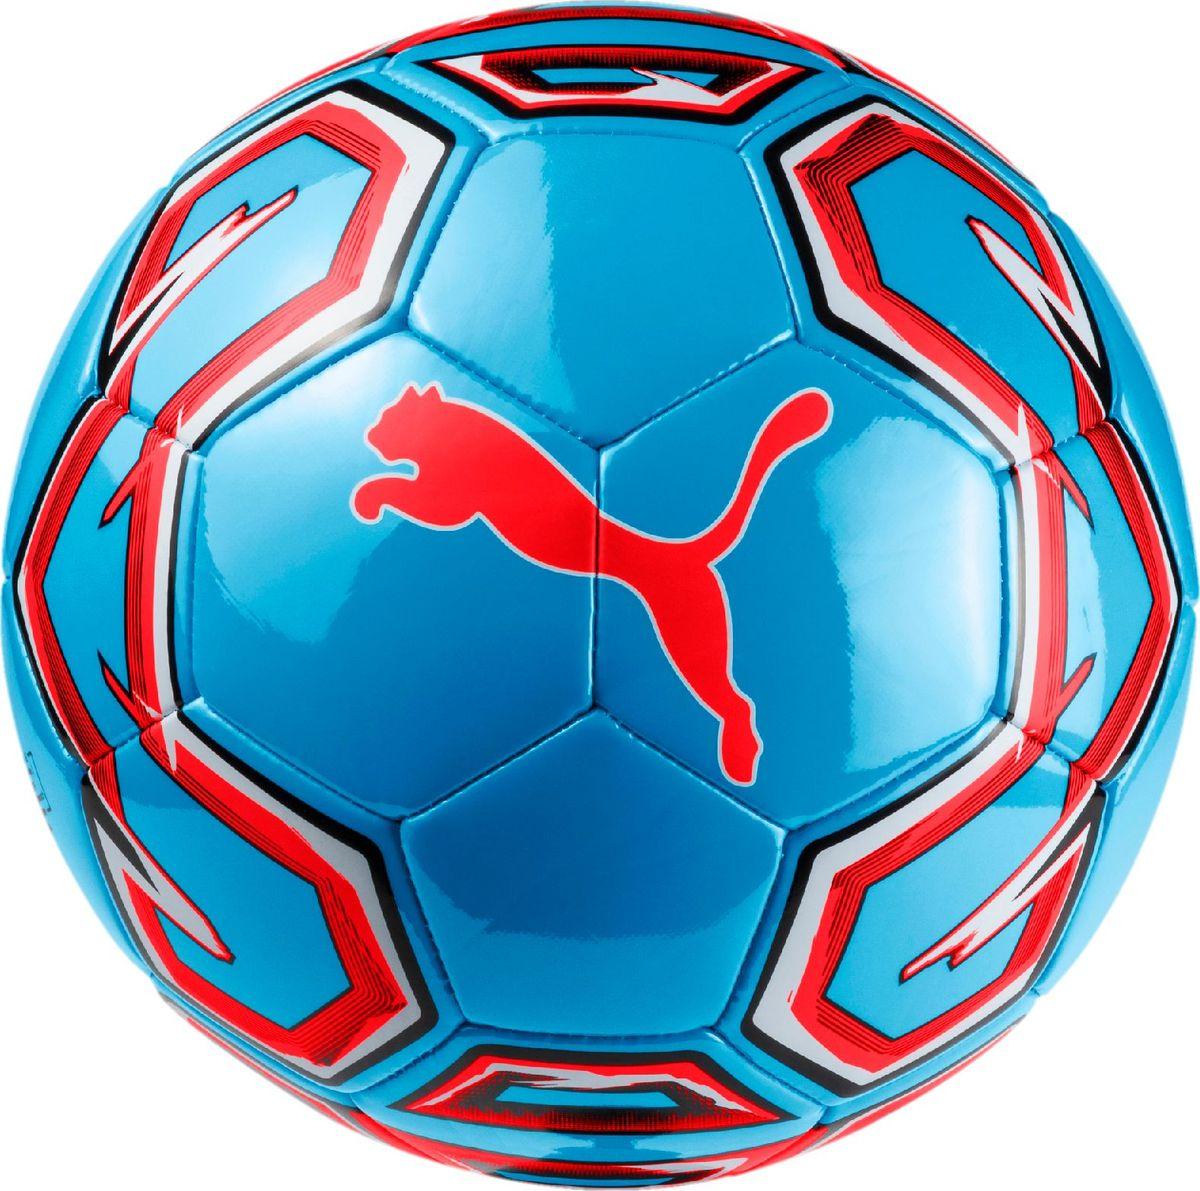 Мяч футбольный Puma Futsal 1 Trainer MS Ball, 08297405, голубой, размер 4 оптимальный вариант оптимальный вариант рок и лирика рок коллекция